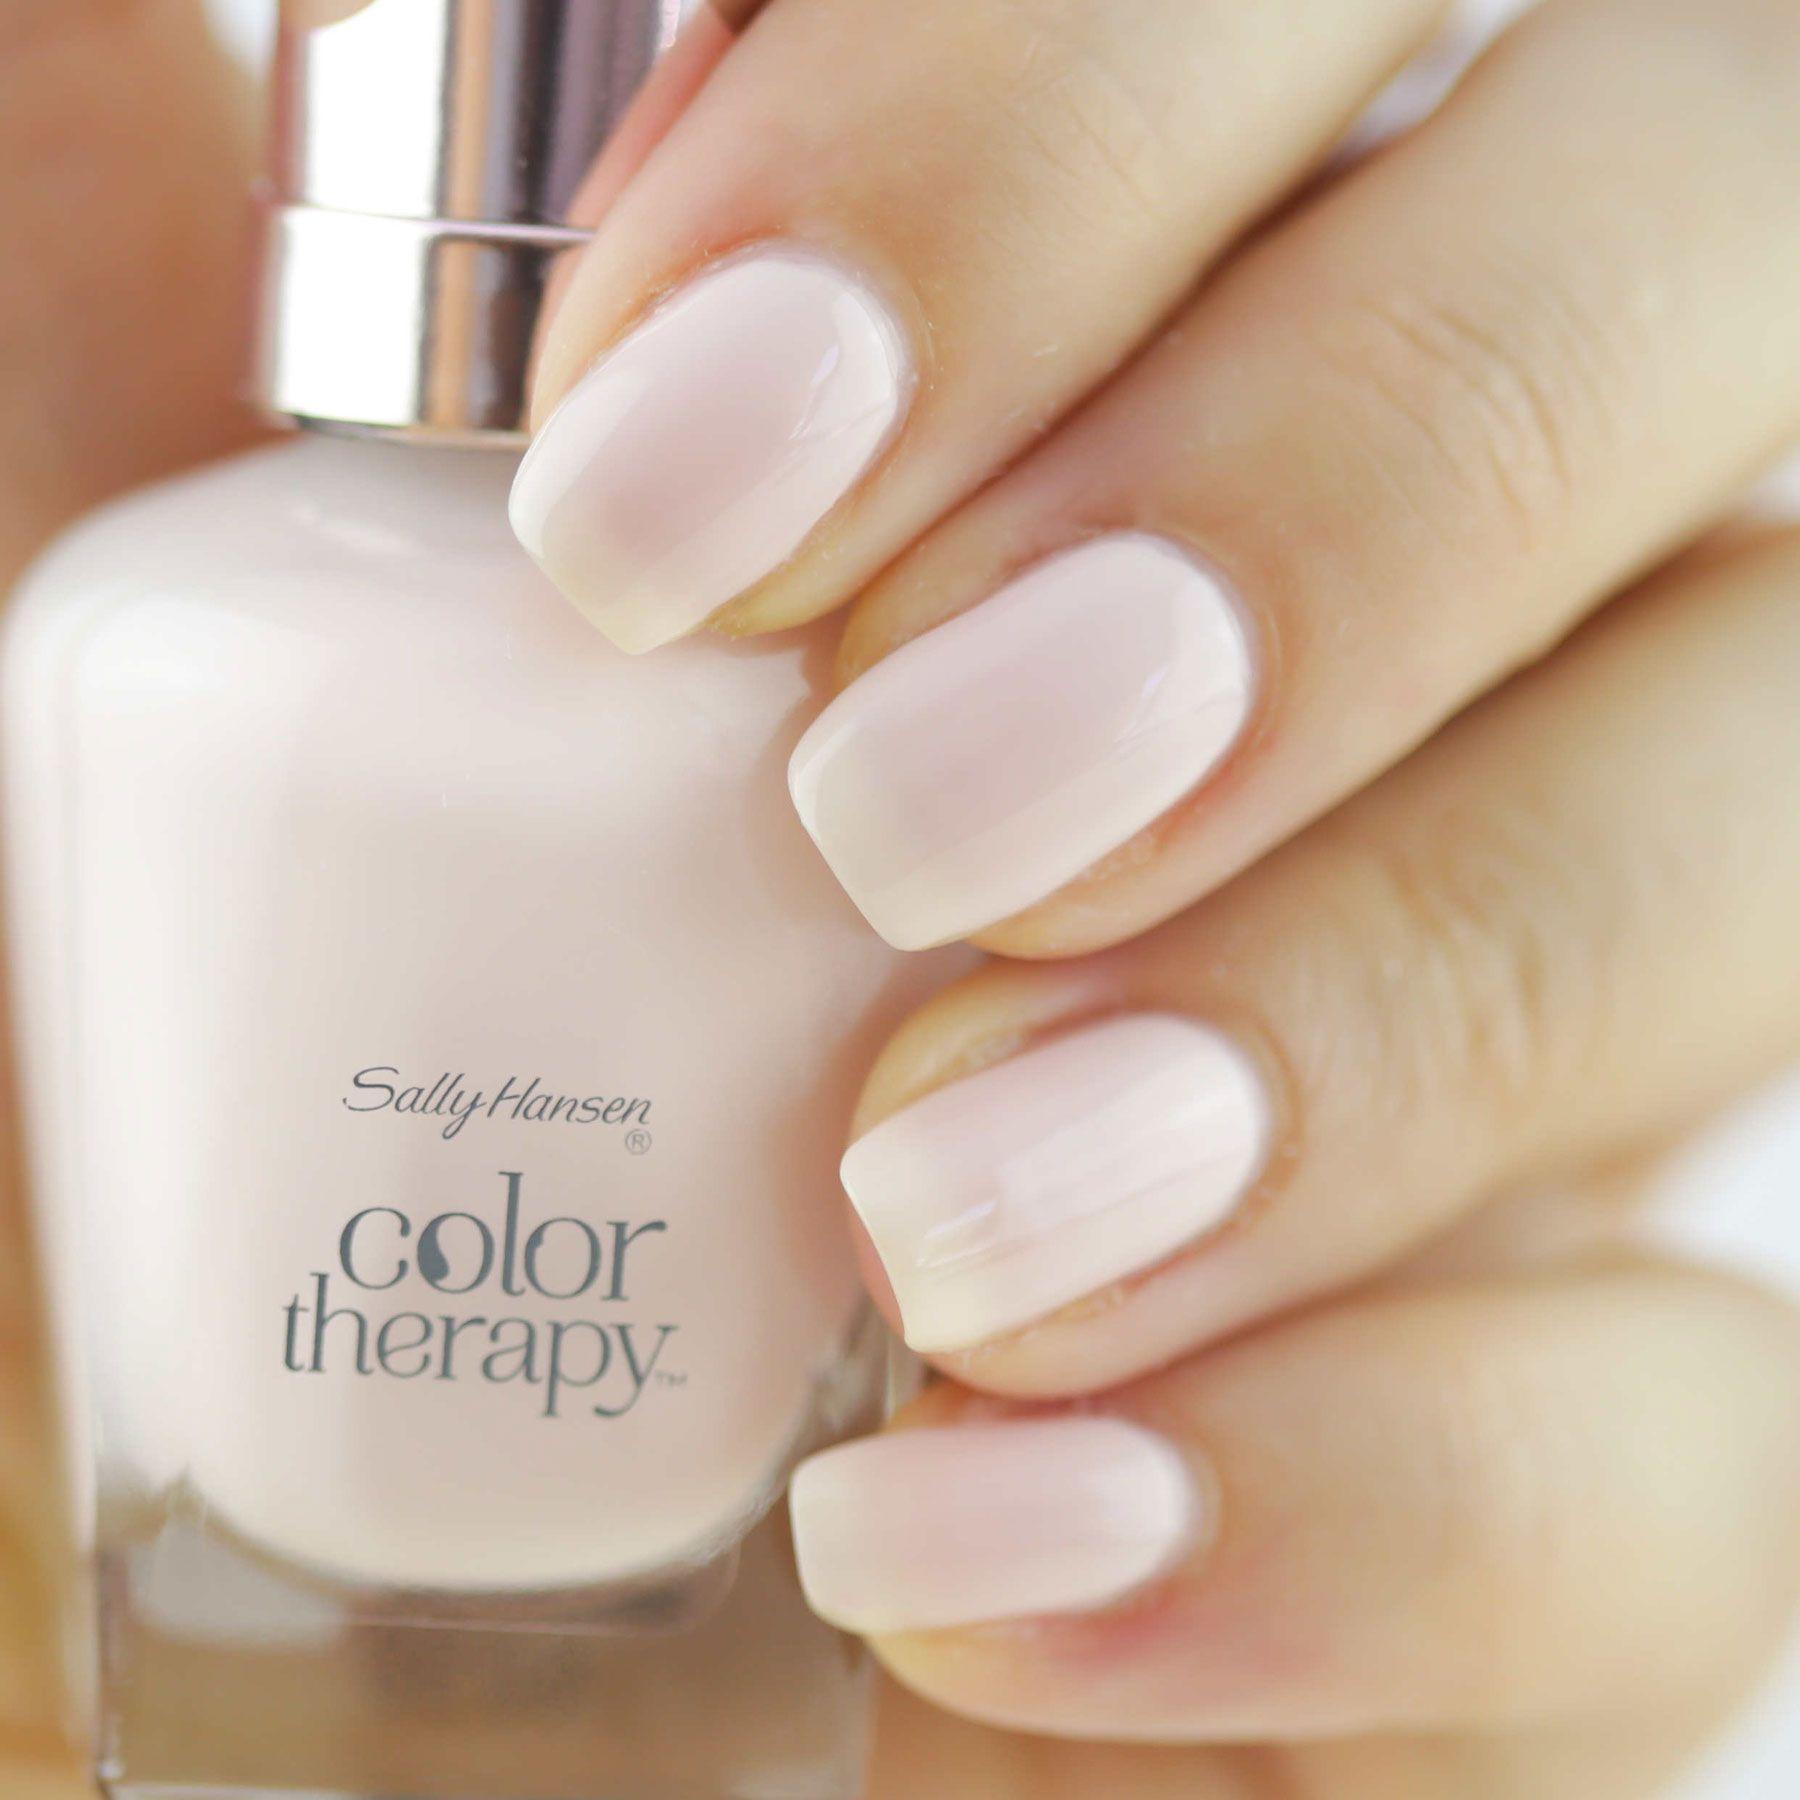 Sally Hansen Color Therapy nail polish in Sheer Nirvana | My MVPs ...